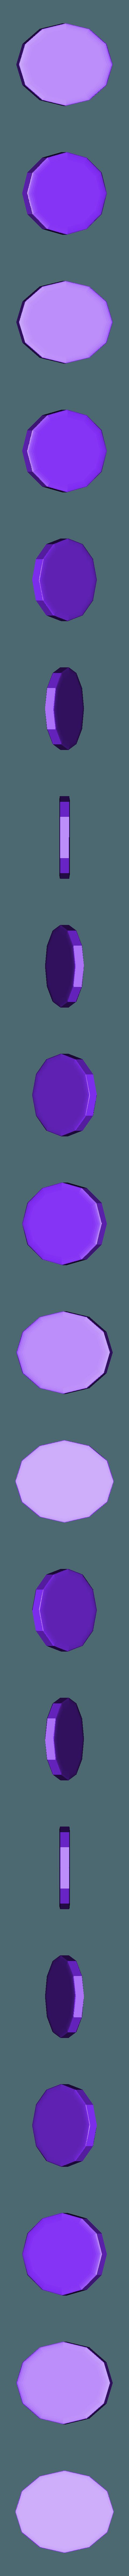 bass.stl Download free STL file egg love • 3D printing object, brayanrosas94